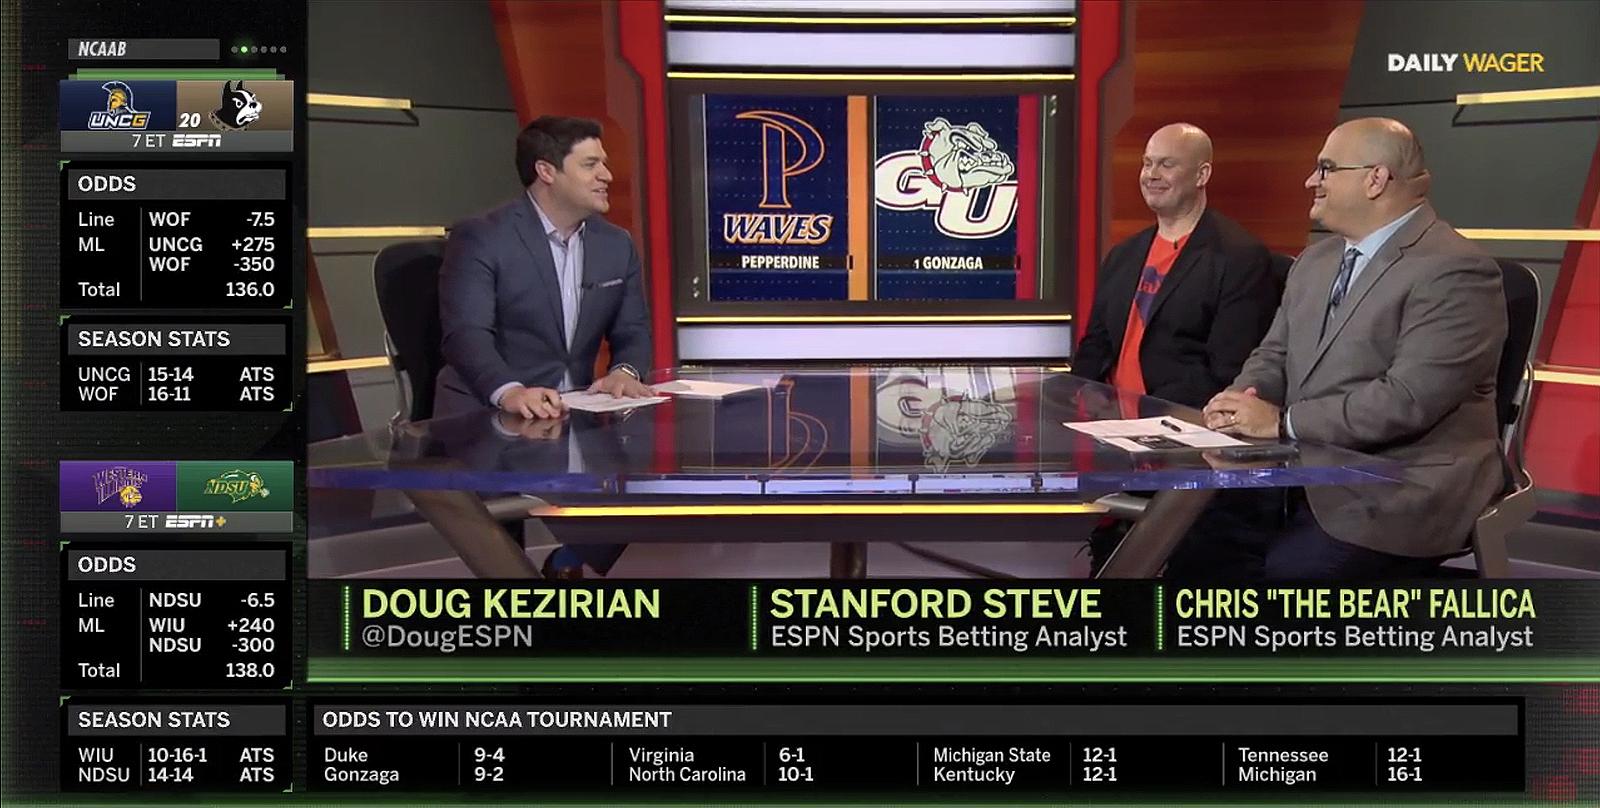 NCS_ESPN-Daily-Wager_Doug-Kezirian_0018